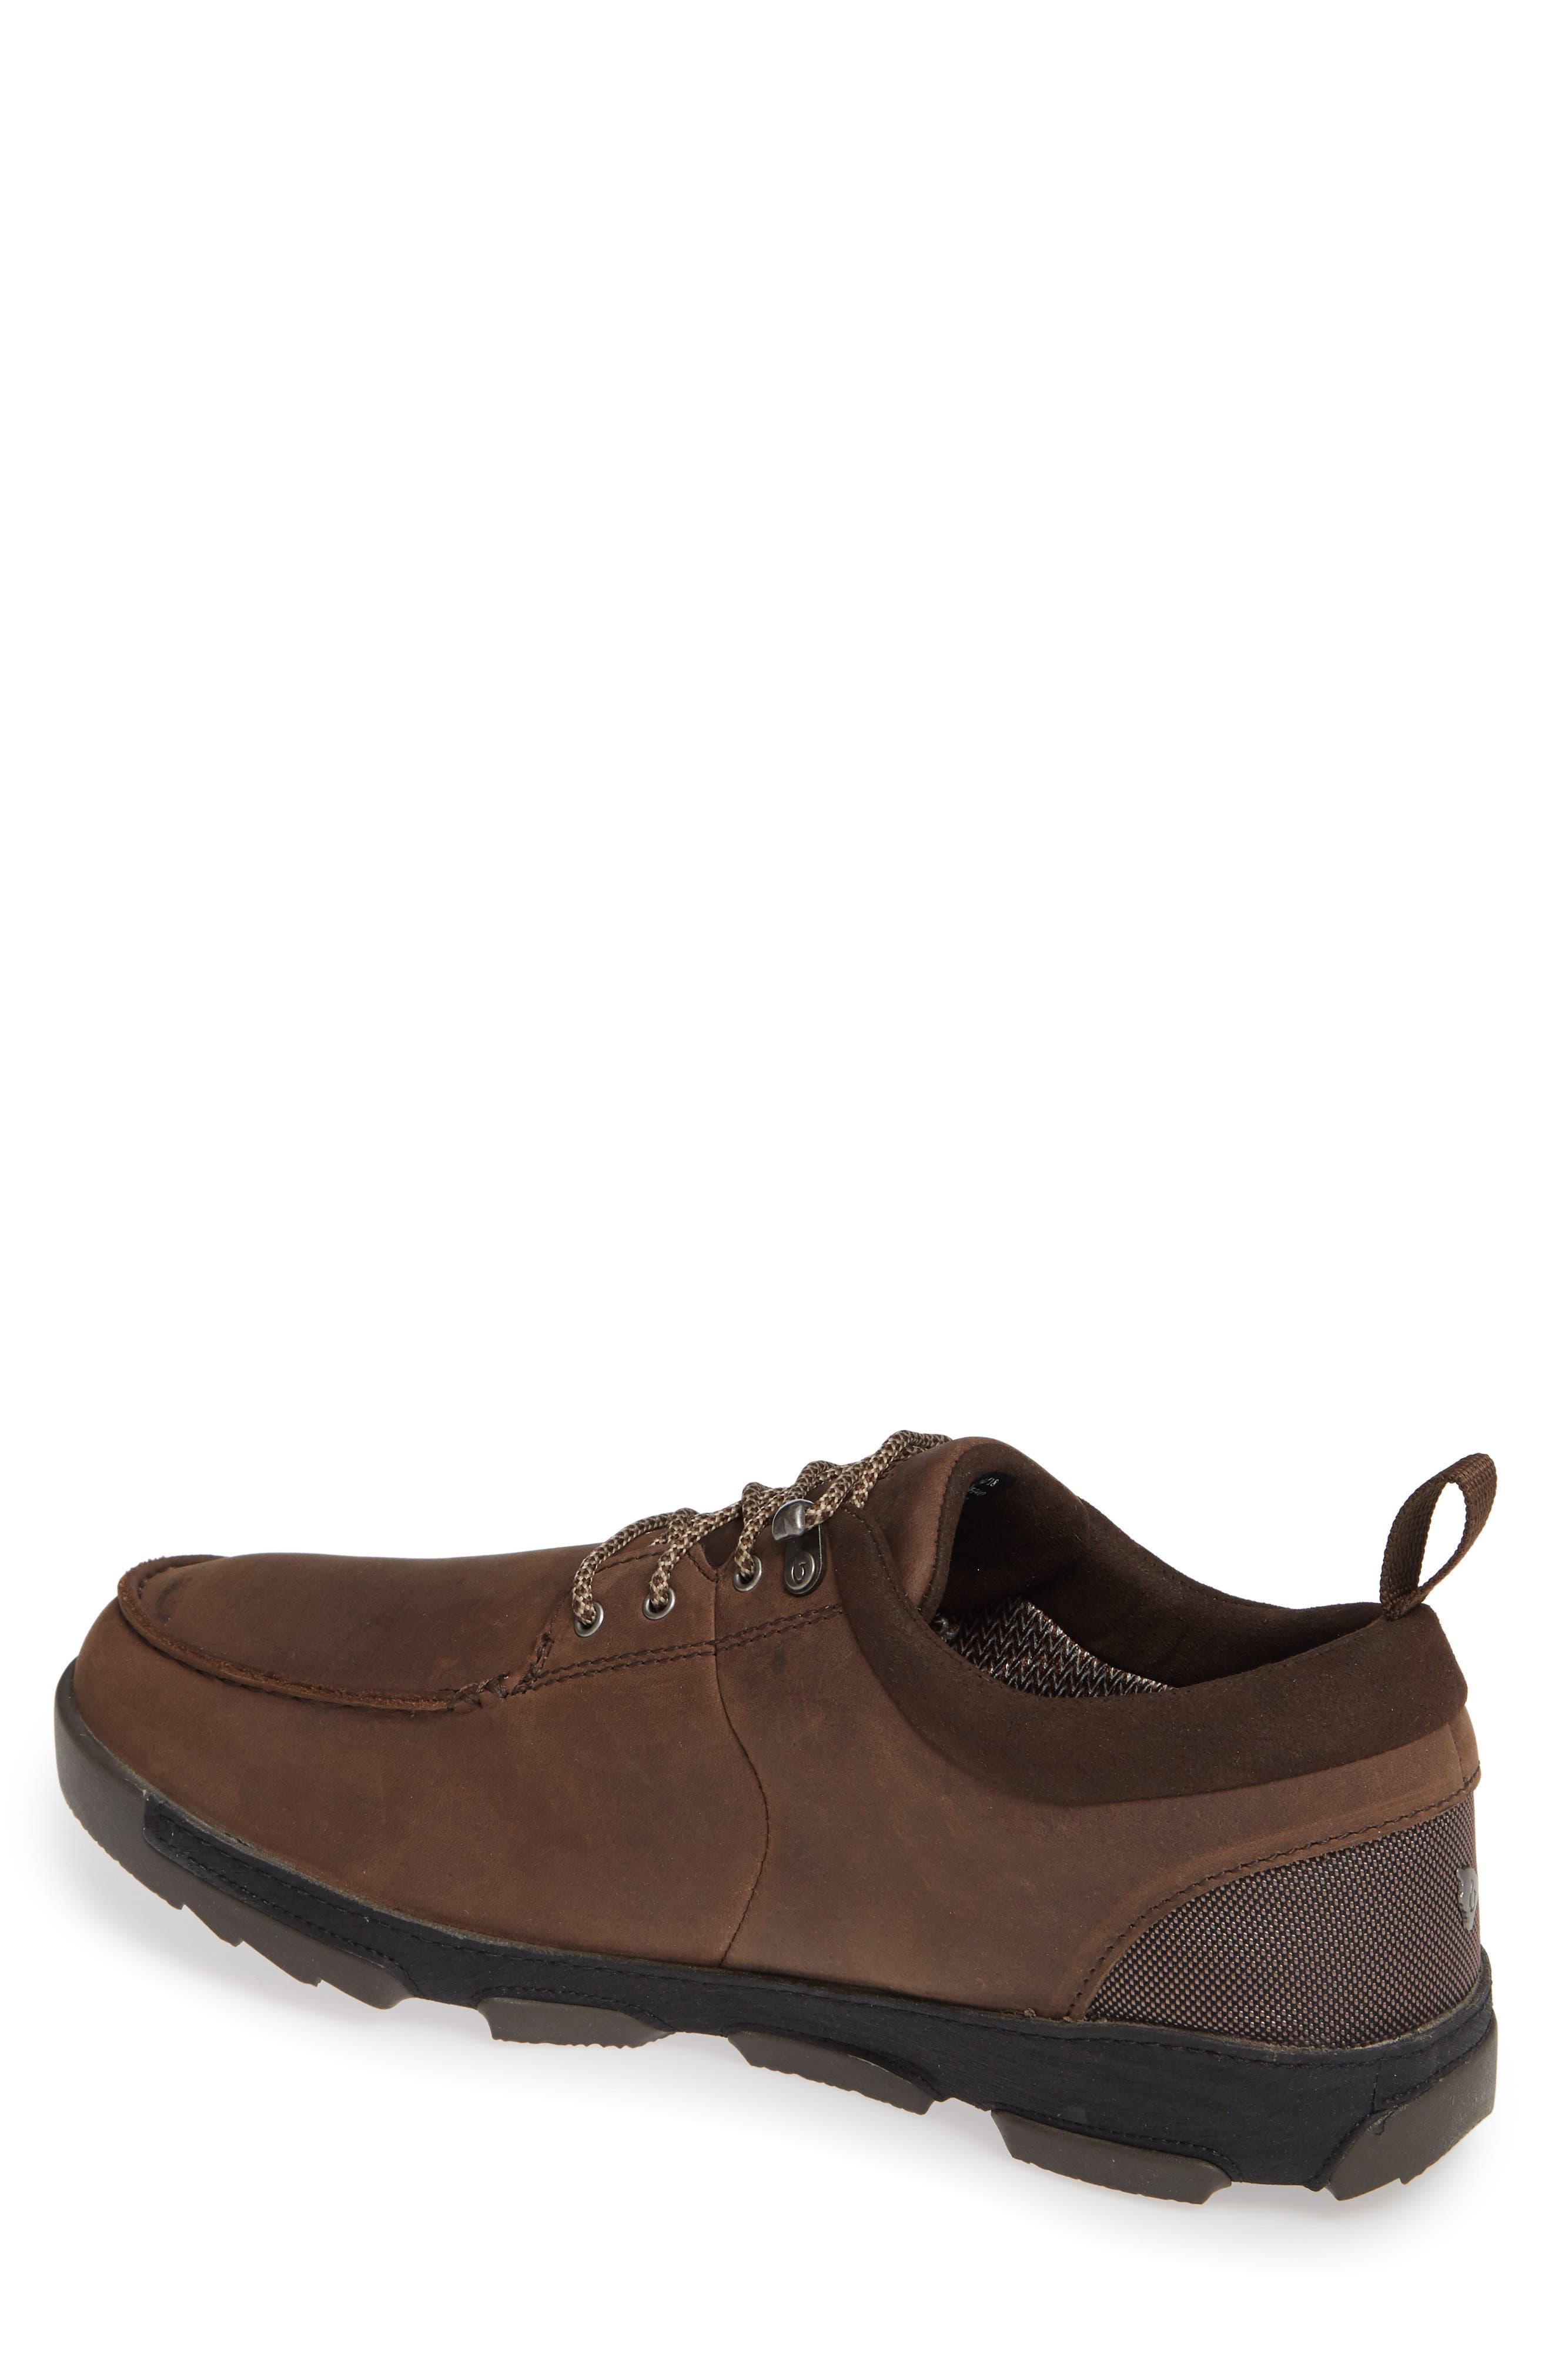 Makoa Waterproof Shoe,                             Alternate thumbnail 2, color,                             ESPRESSO/ BLACK LEATHER